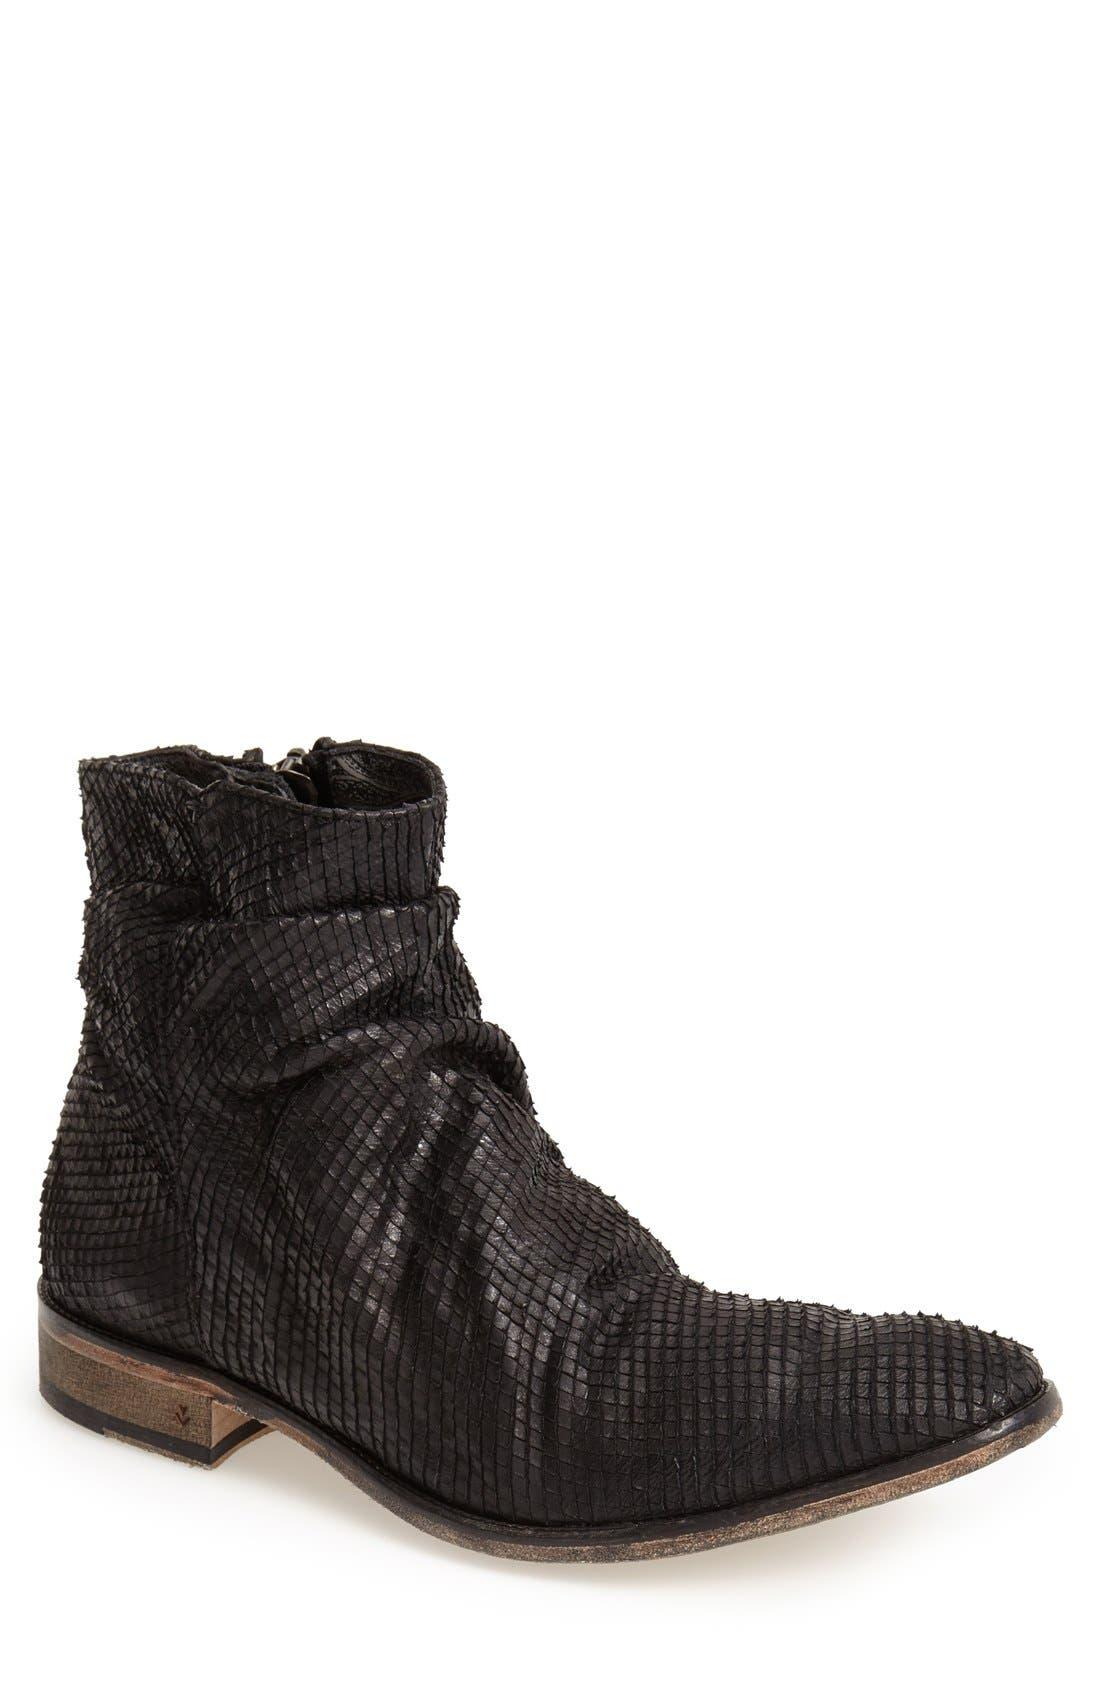 JOHN VARVATOS Collection 'Richards - Sharpei' Zip Boot, Main, color, 001